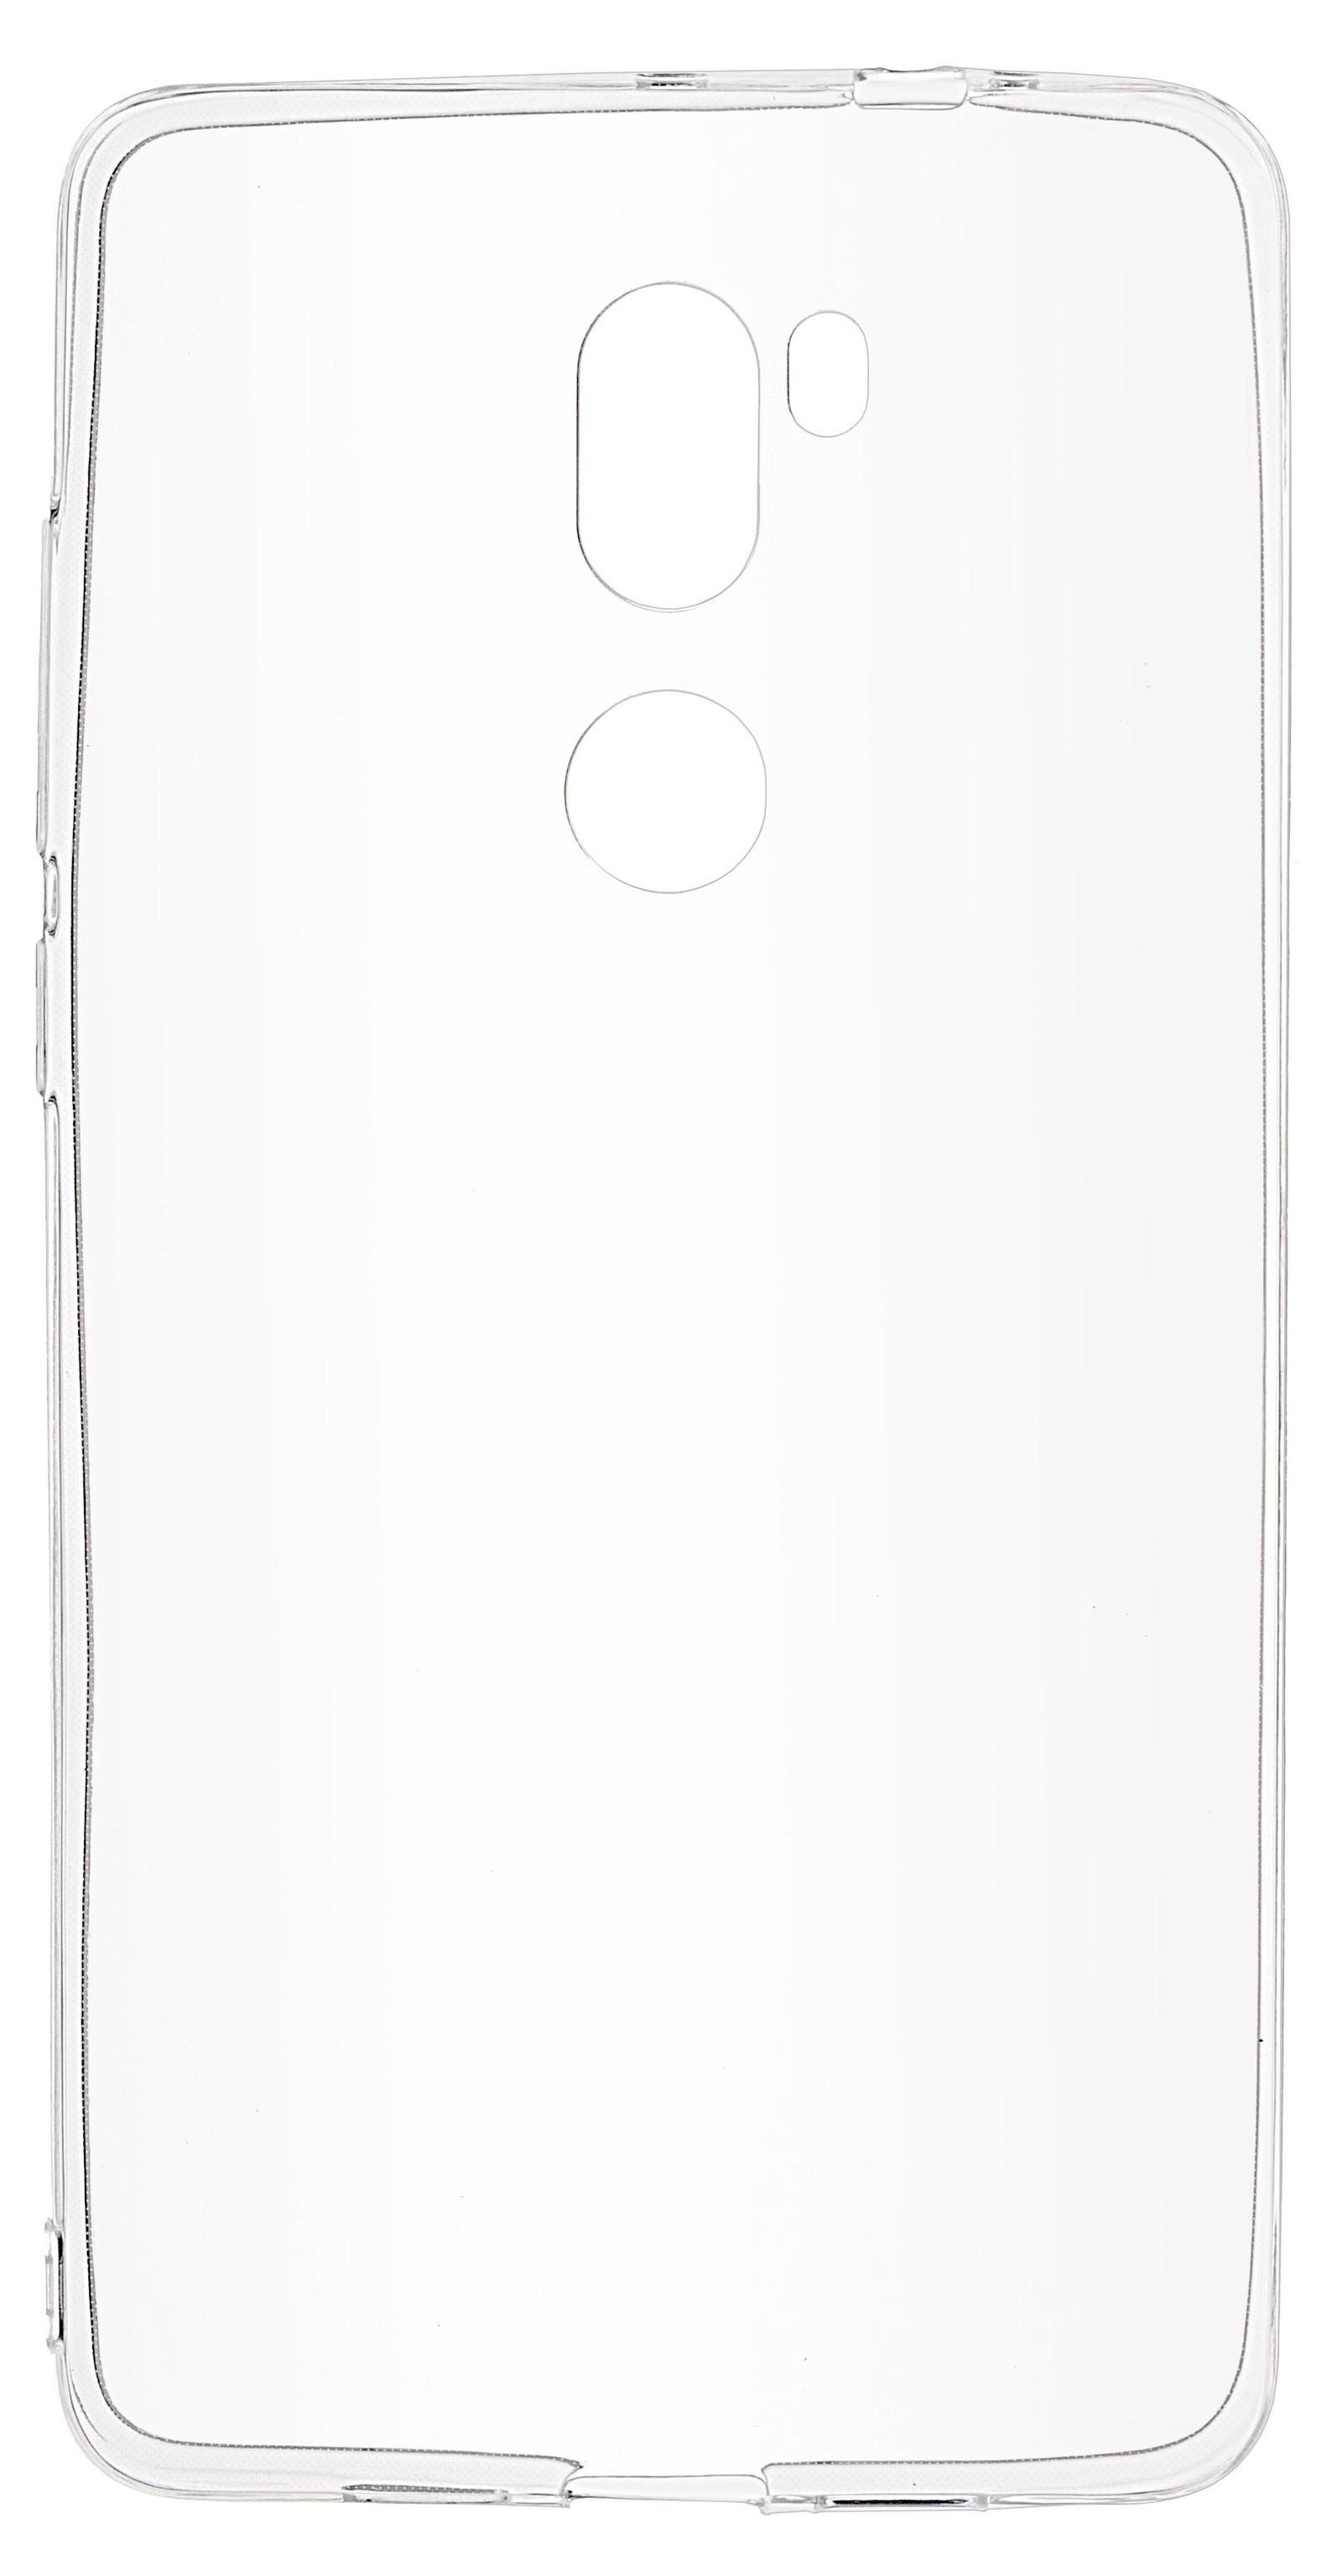 Чехол для сотового телефона skinBOX Slim Silicone, 4630042528956, прозрачный чехол для сотового телефона skinbox slim silicone 4660041408157 прозрачный